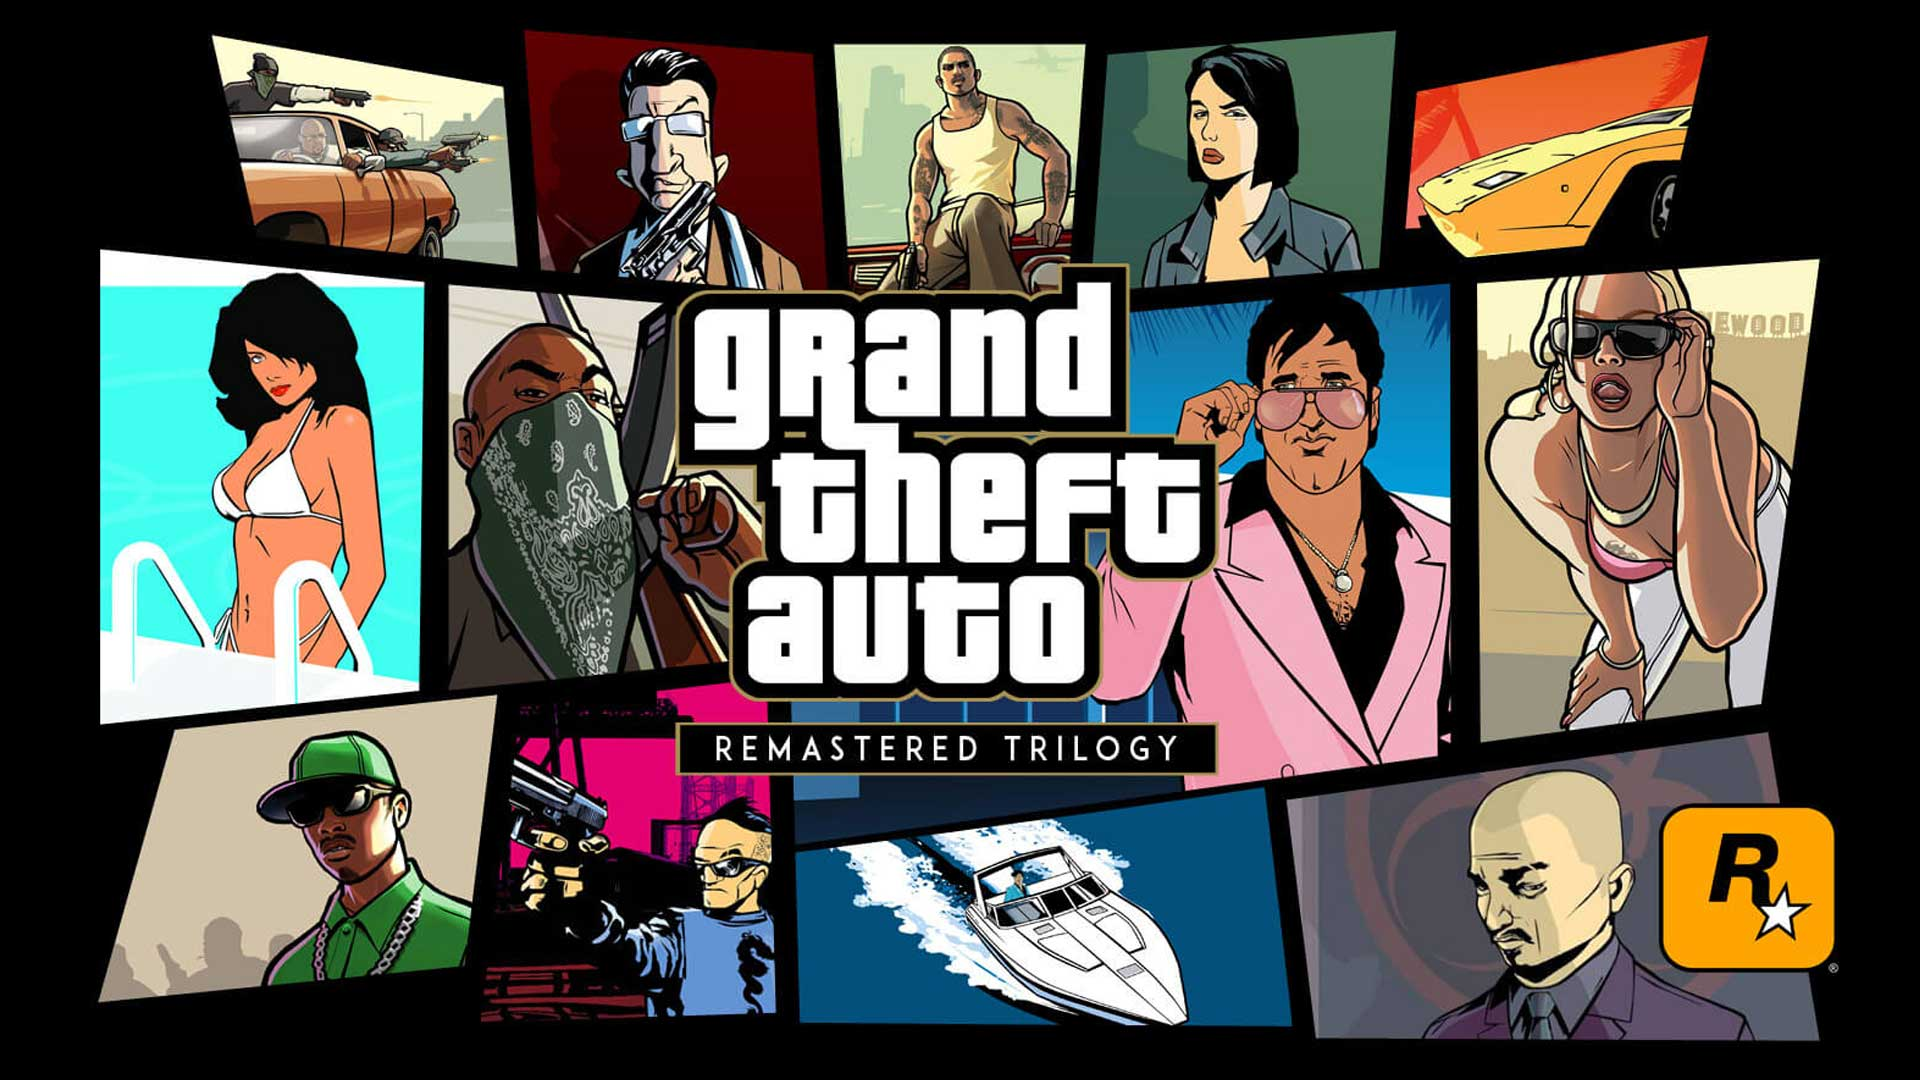 Rockstar анонсировало переиздание трилогии Grand Theft Auto